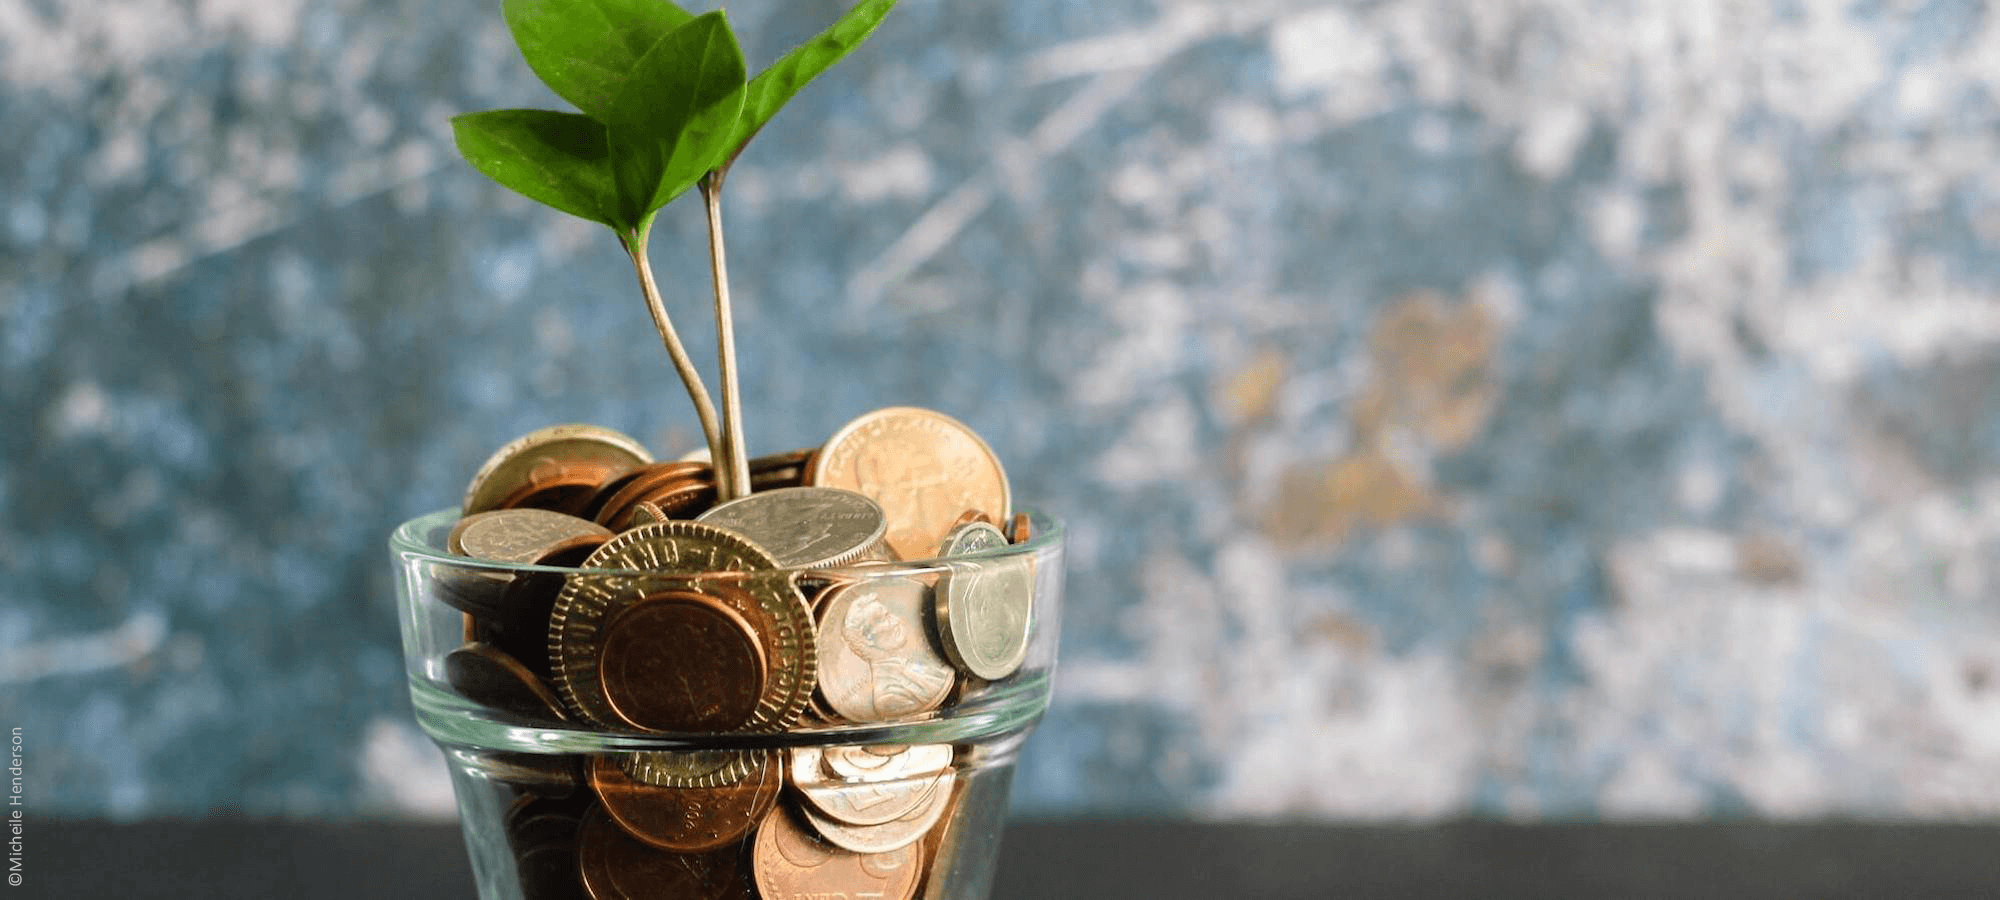 Neukundengewinnung Bank optimieren